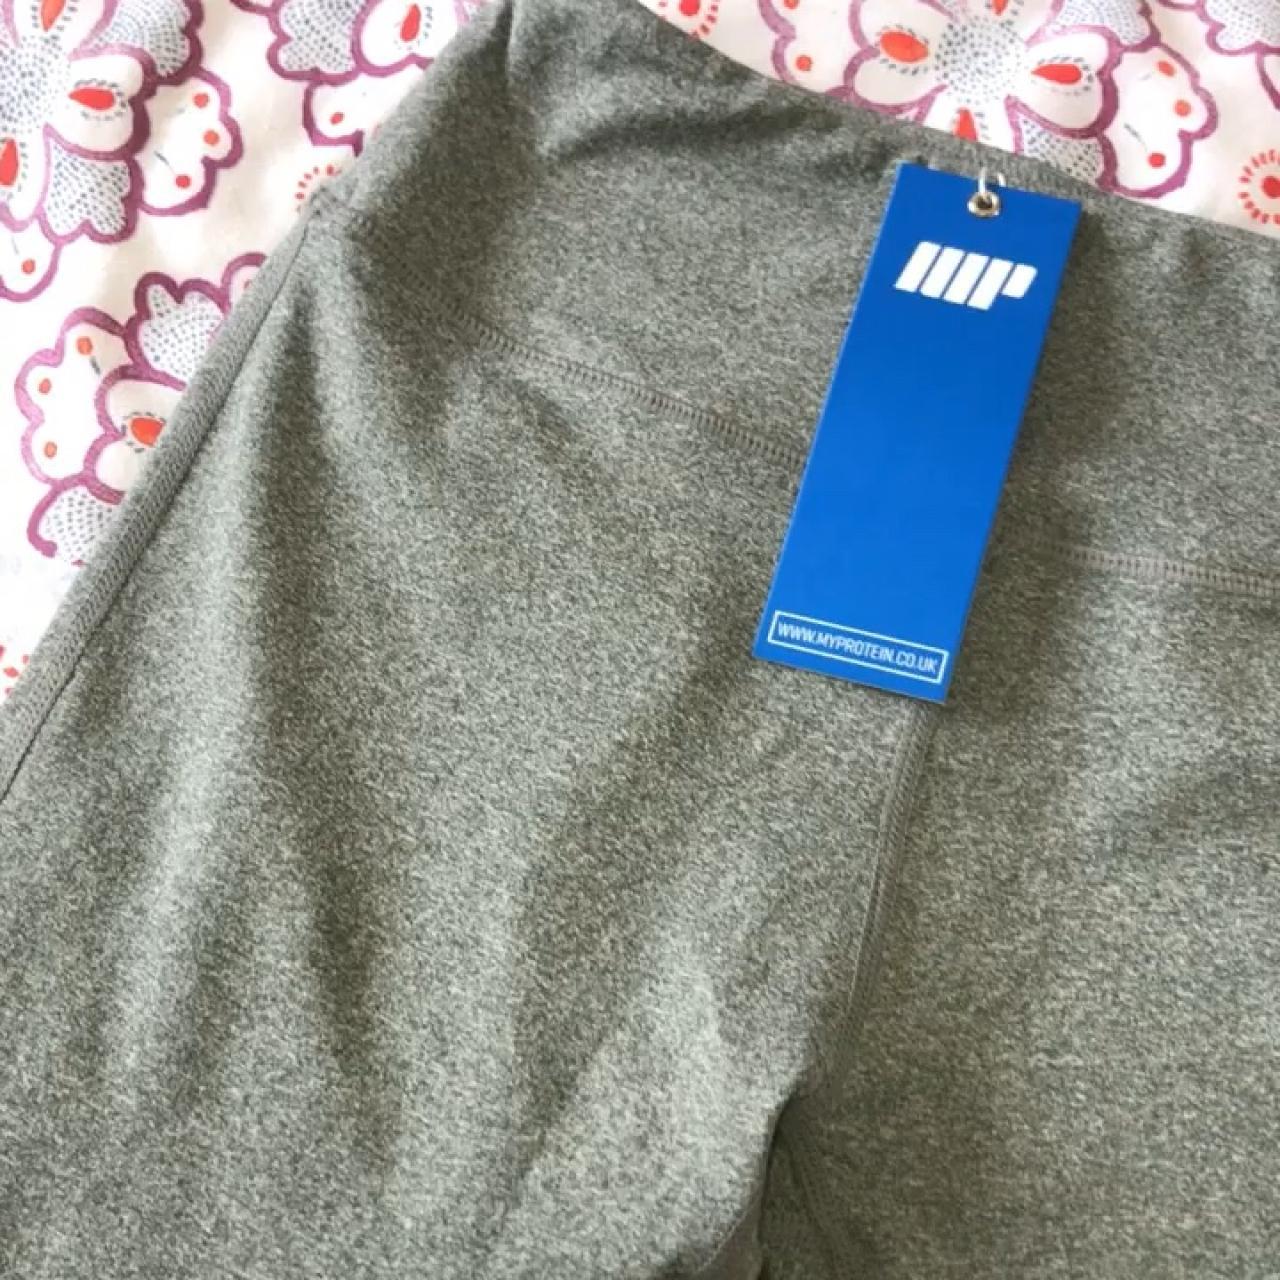 265cd31ce8f211 MYPROTEIN heartbeat mesh full length leggings in grey. High - Depop